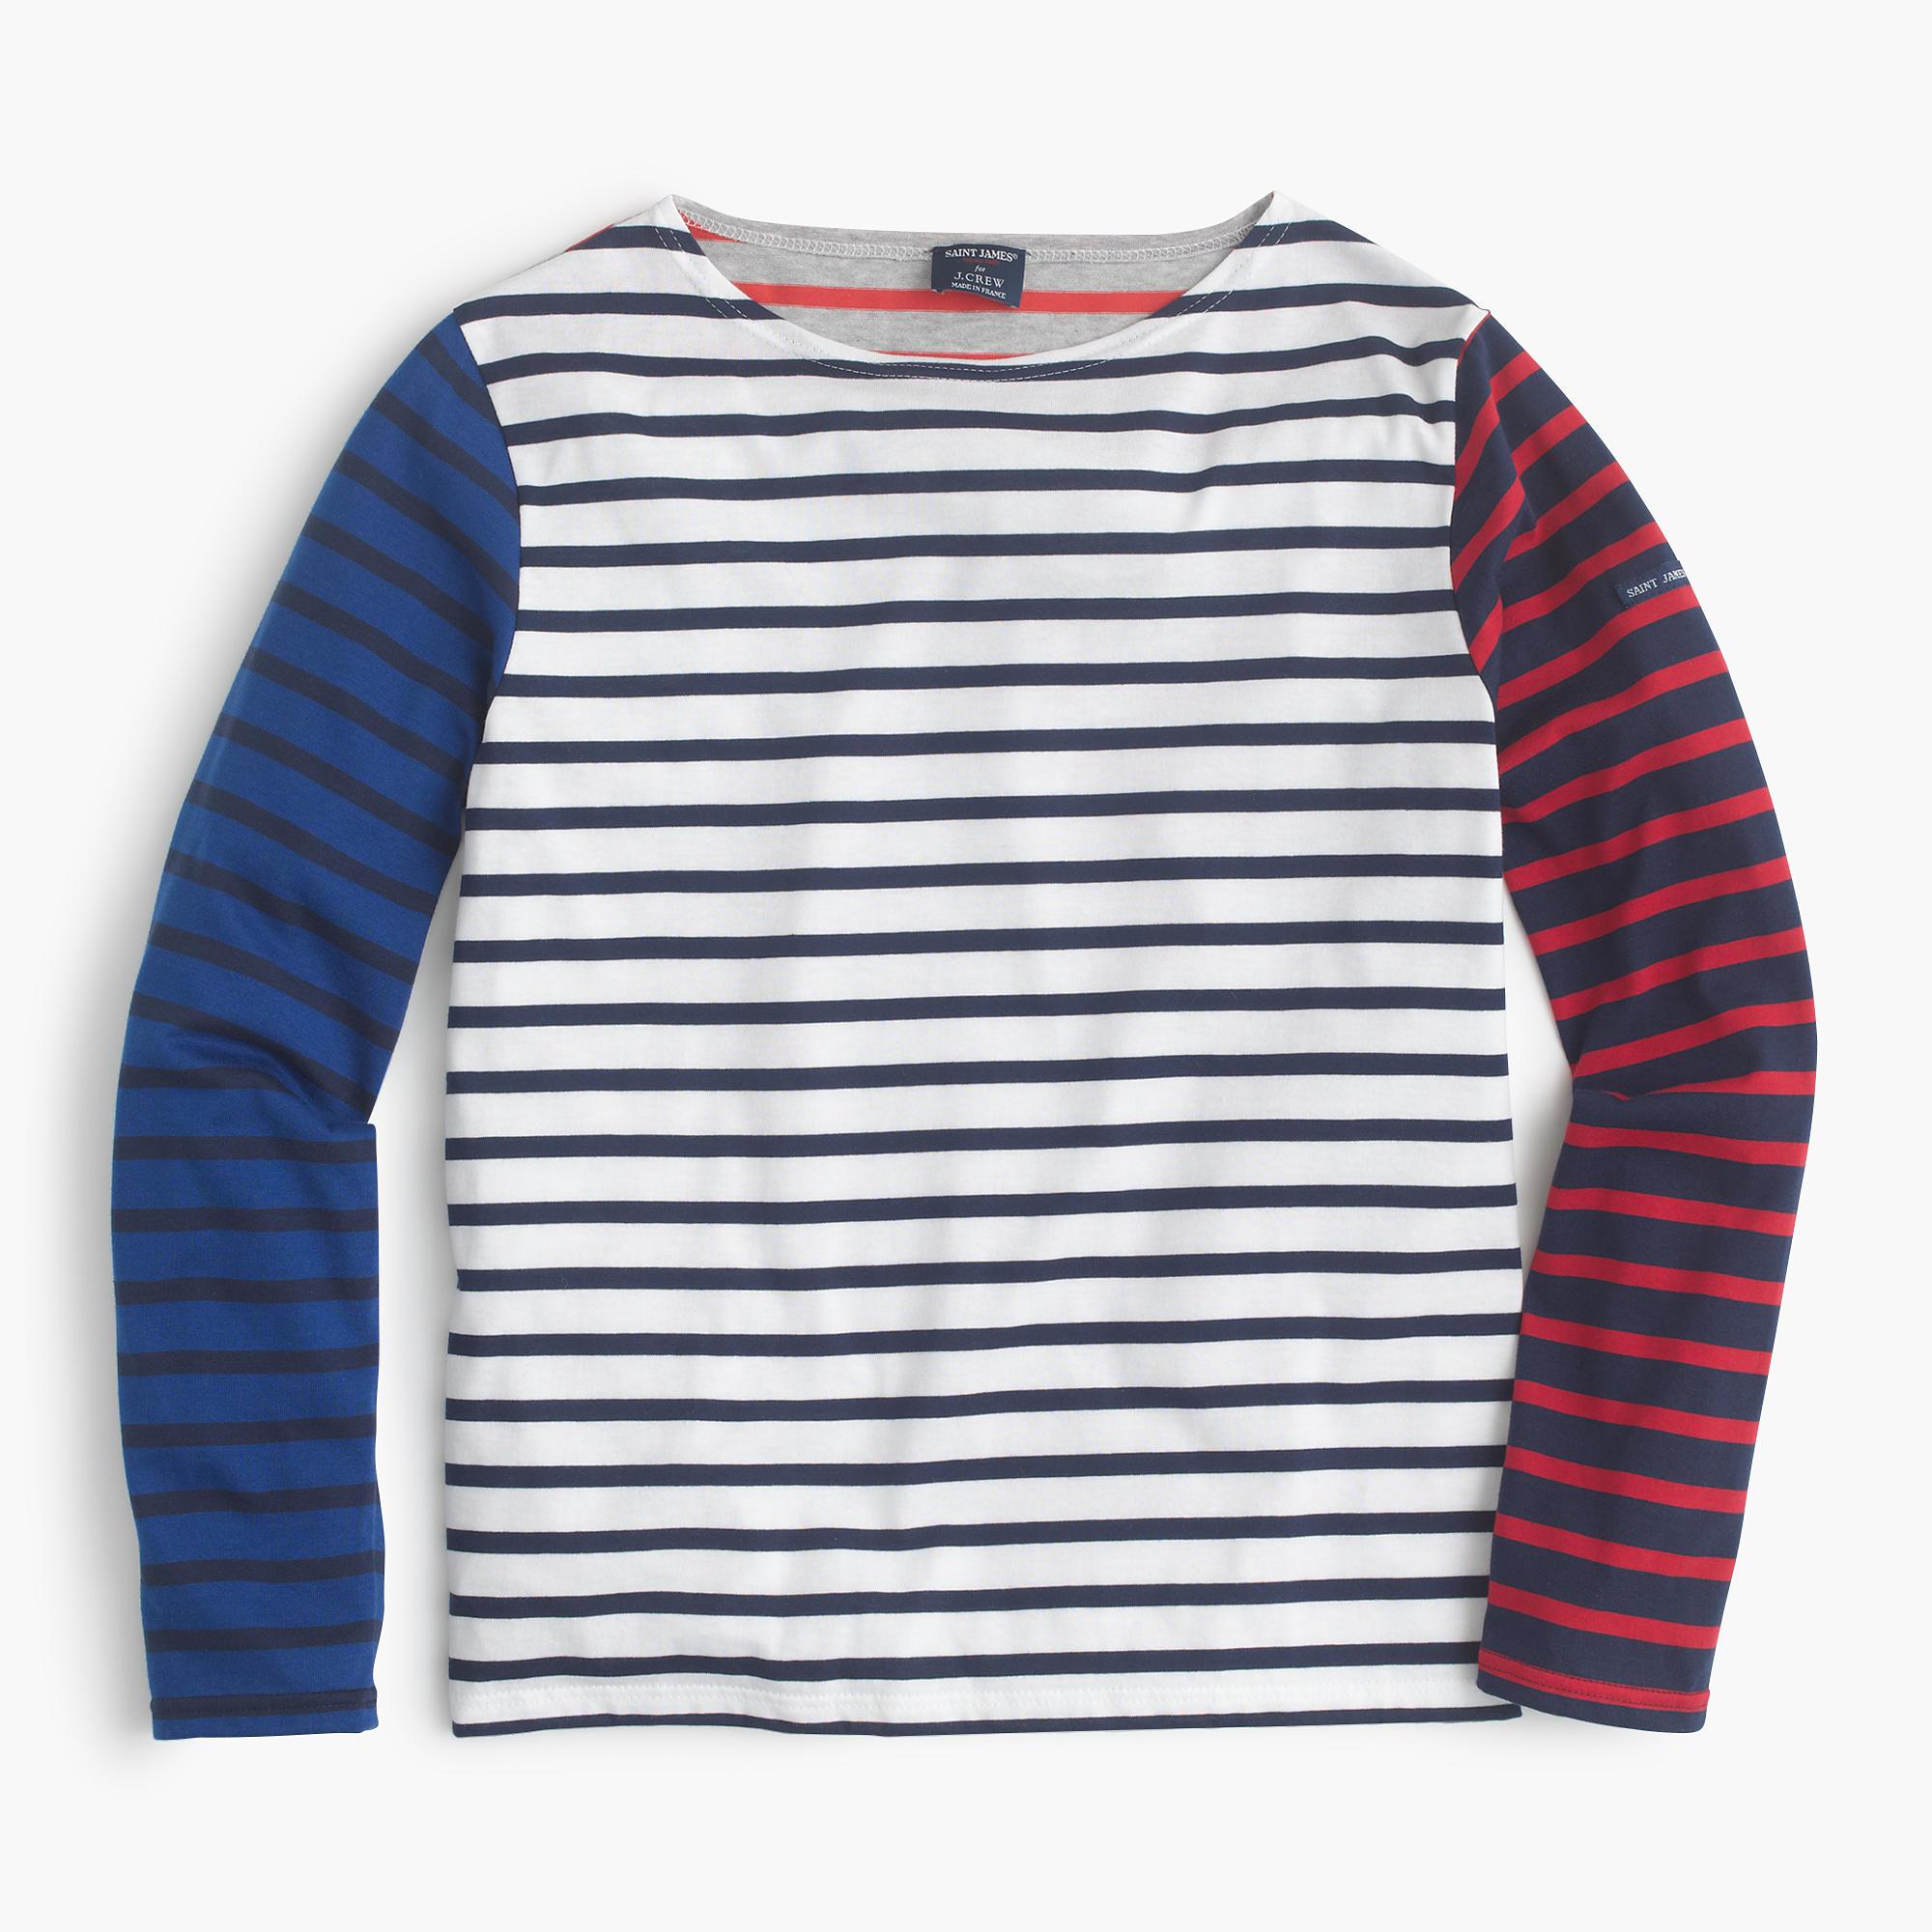 Saint james colorblock stripe t shirt in blue for St james striped shirt